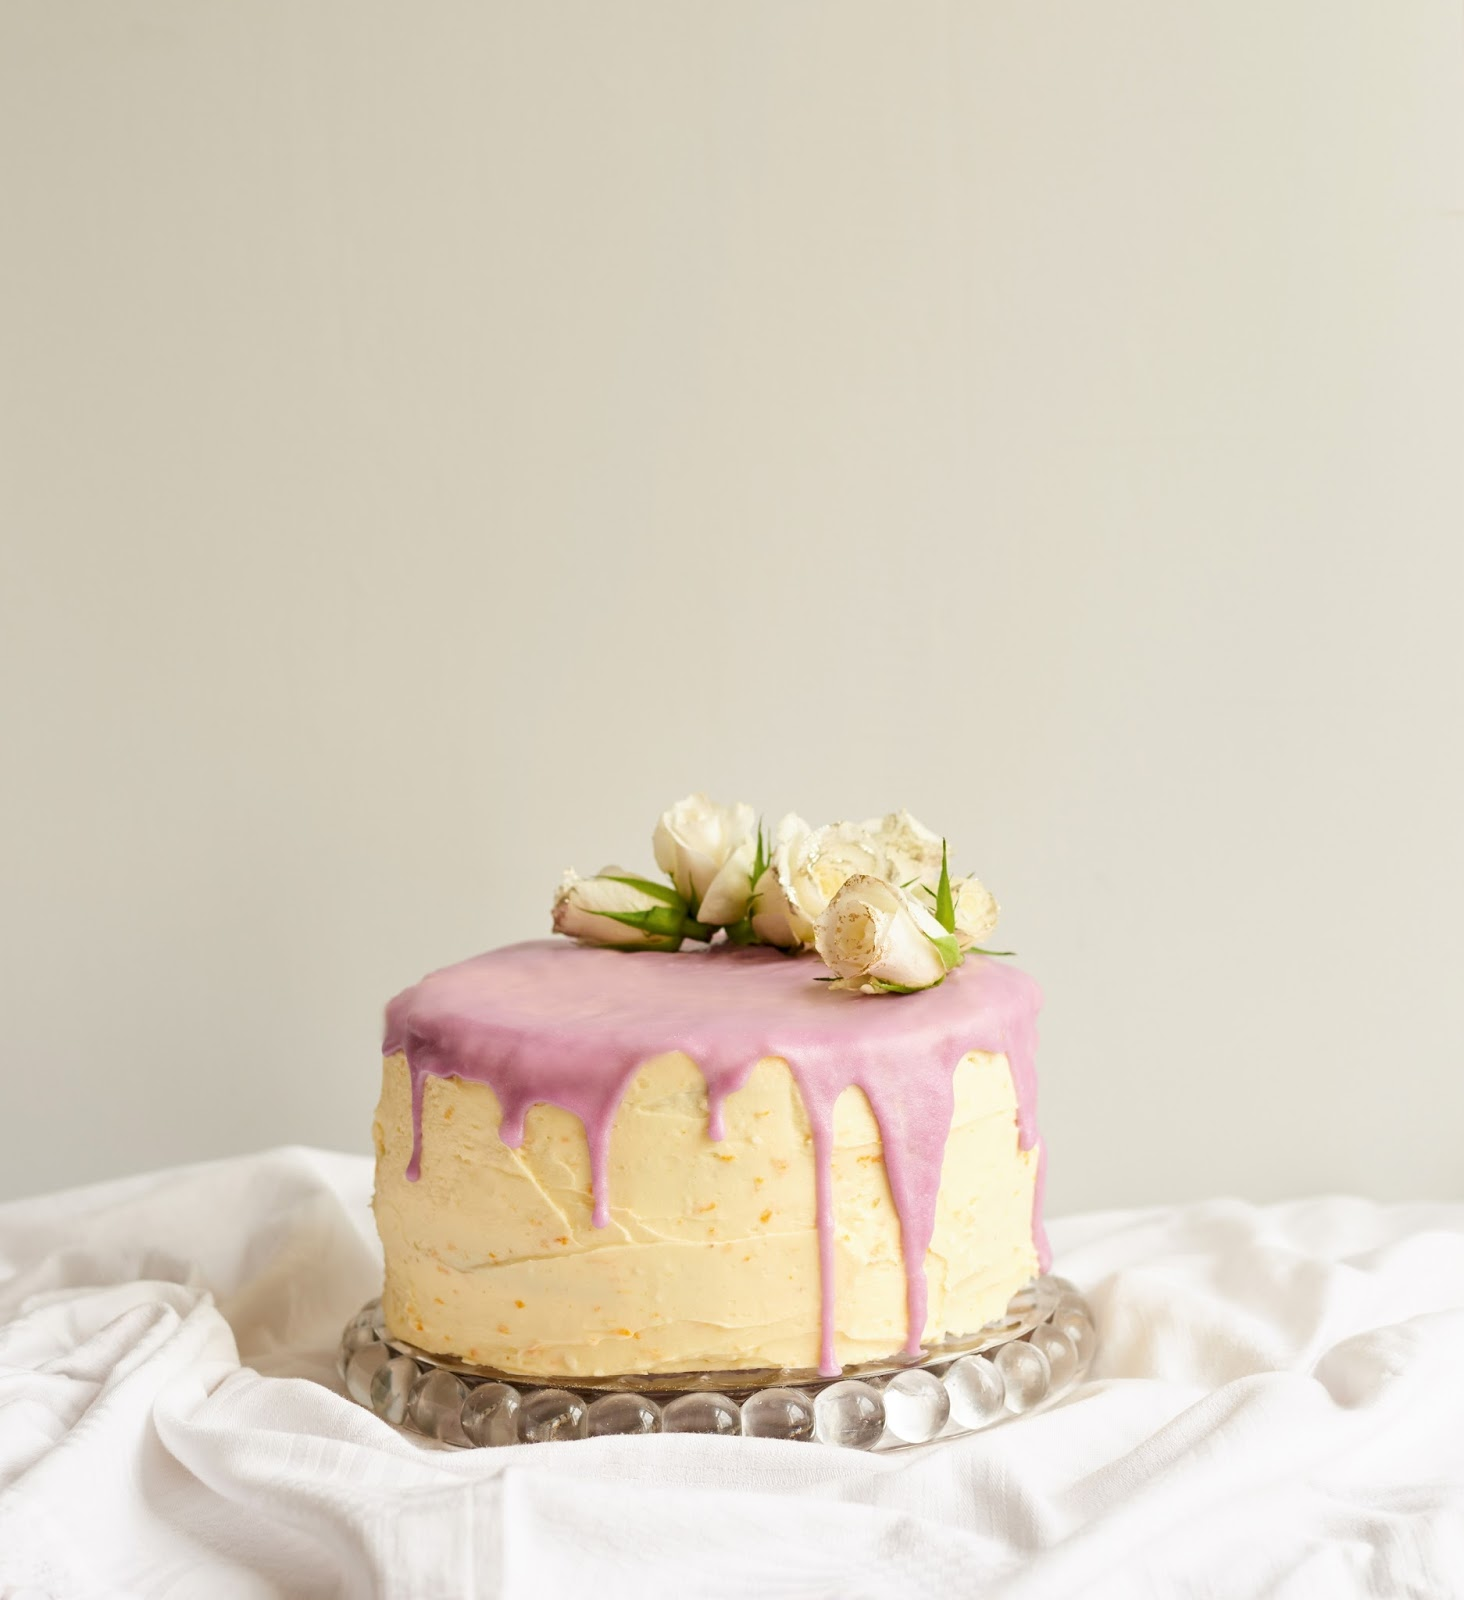 Nadiya's Queen Cake: Her Majesty's Cake By Nadiya